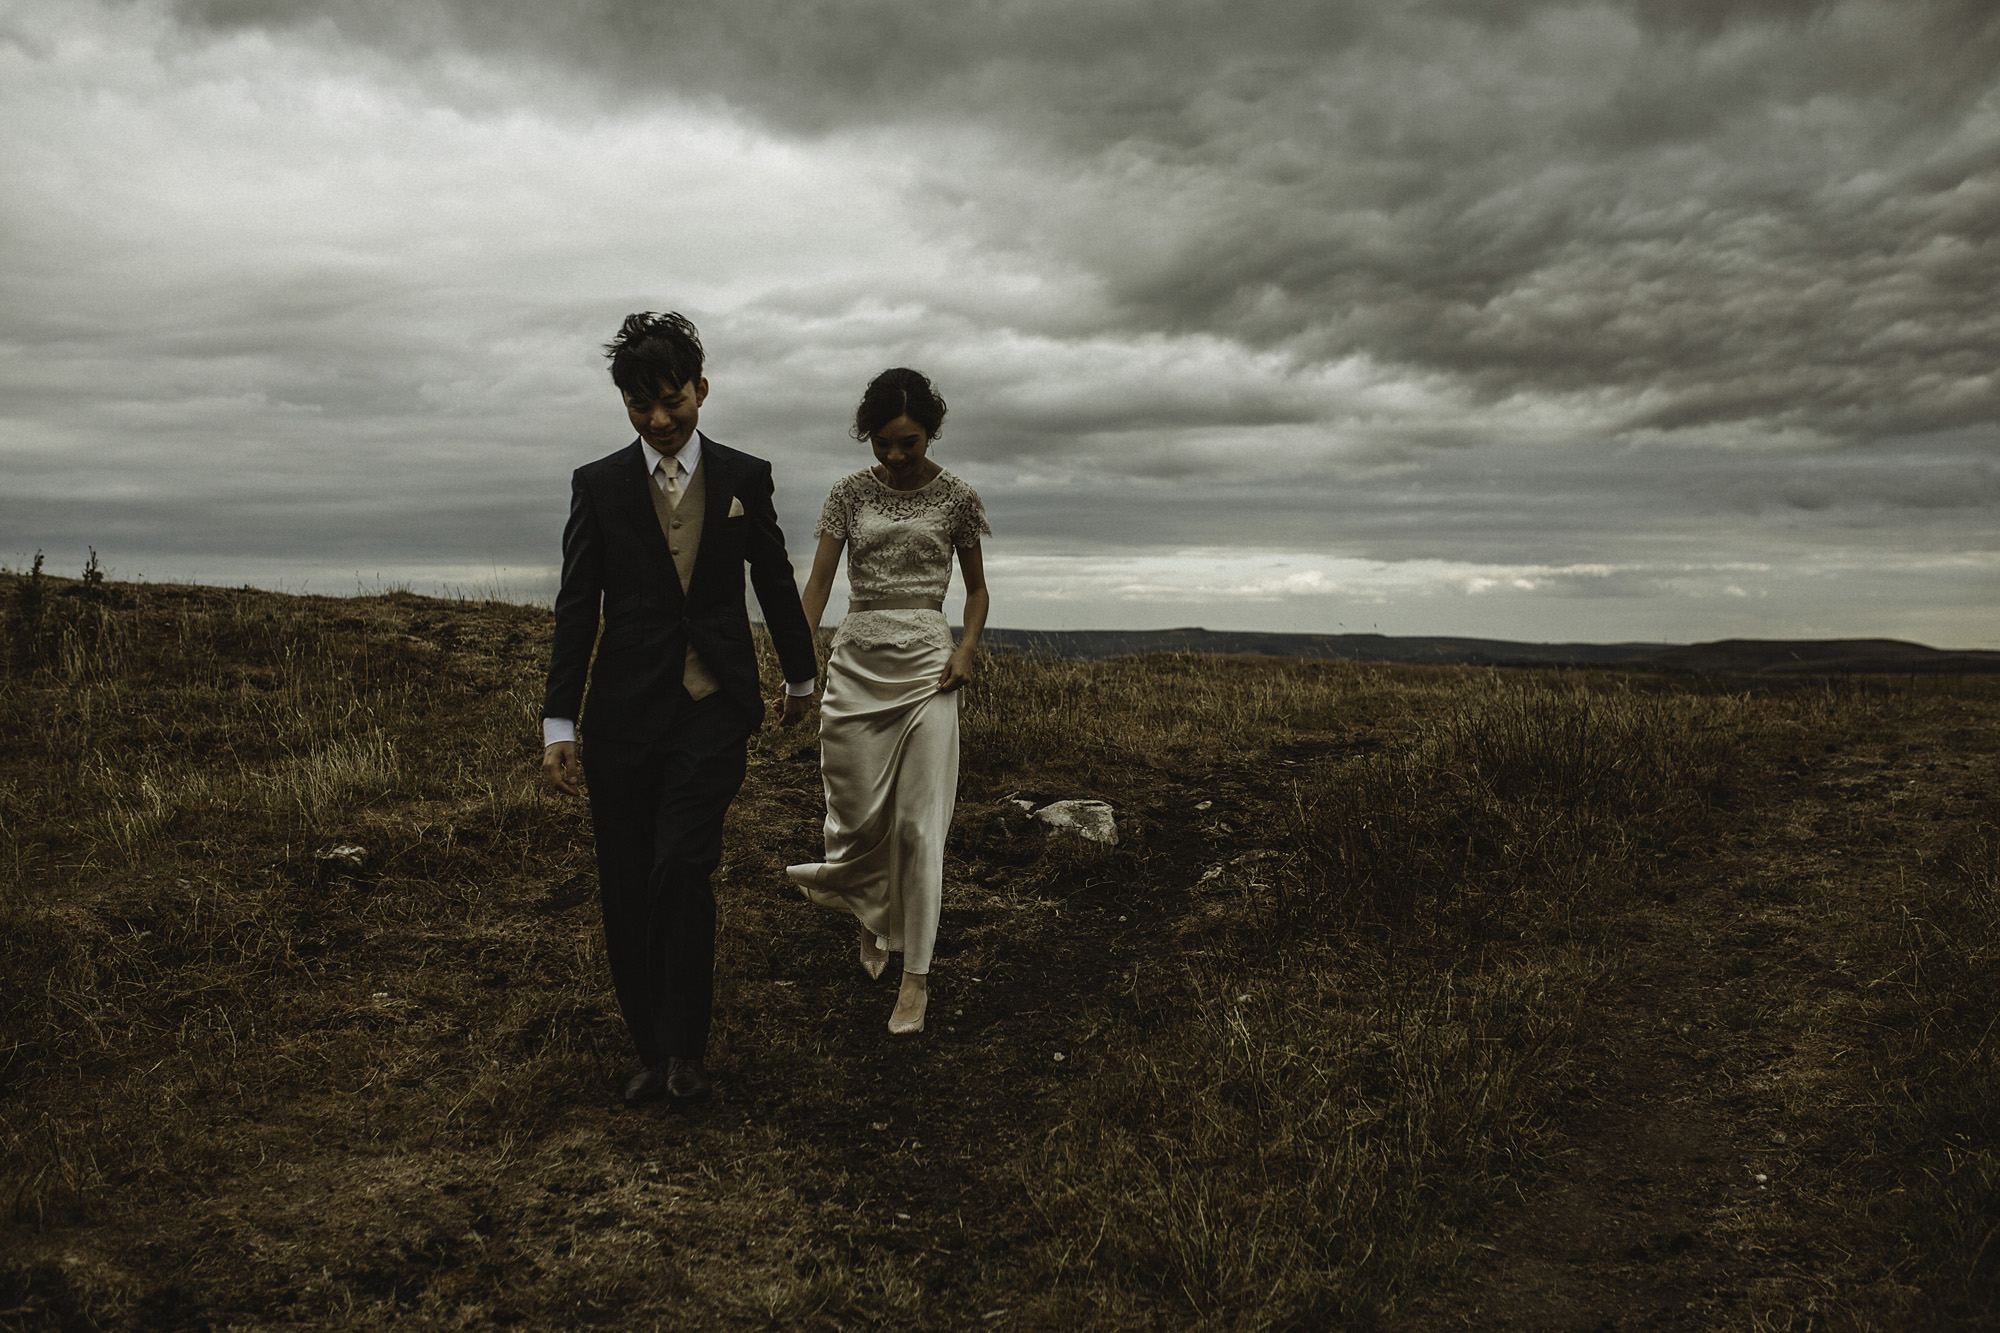 Kate-Beaumont-Wedding-Dress-Bridal-Separates-Peak-District-Shoot-17.jpg